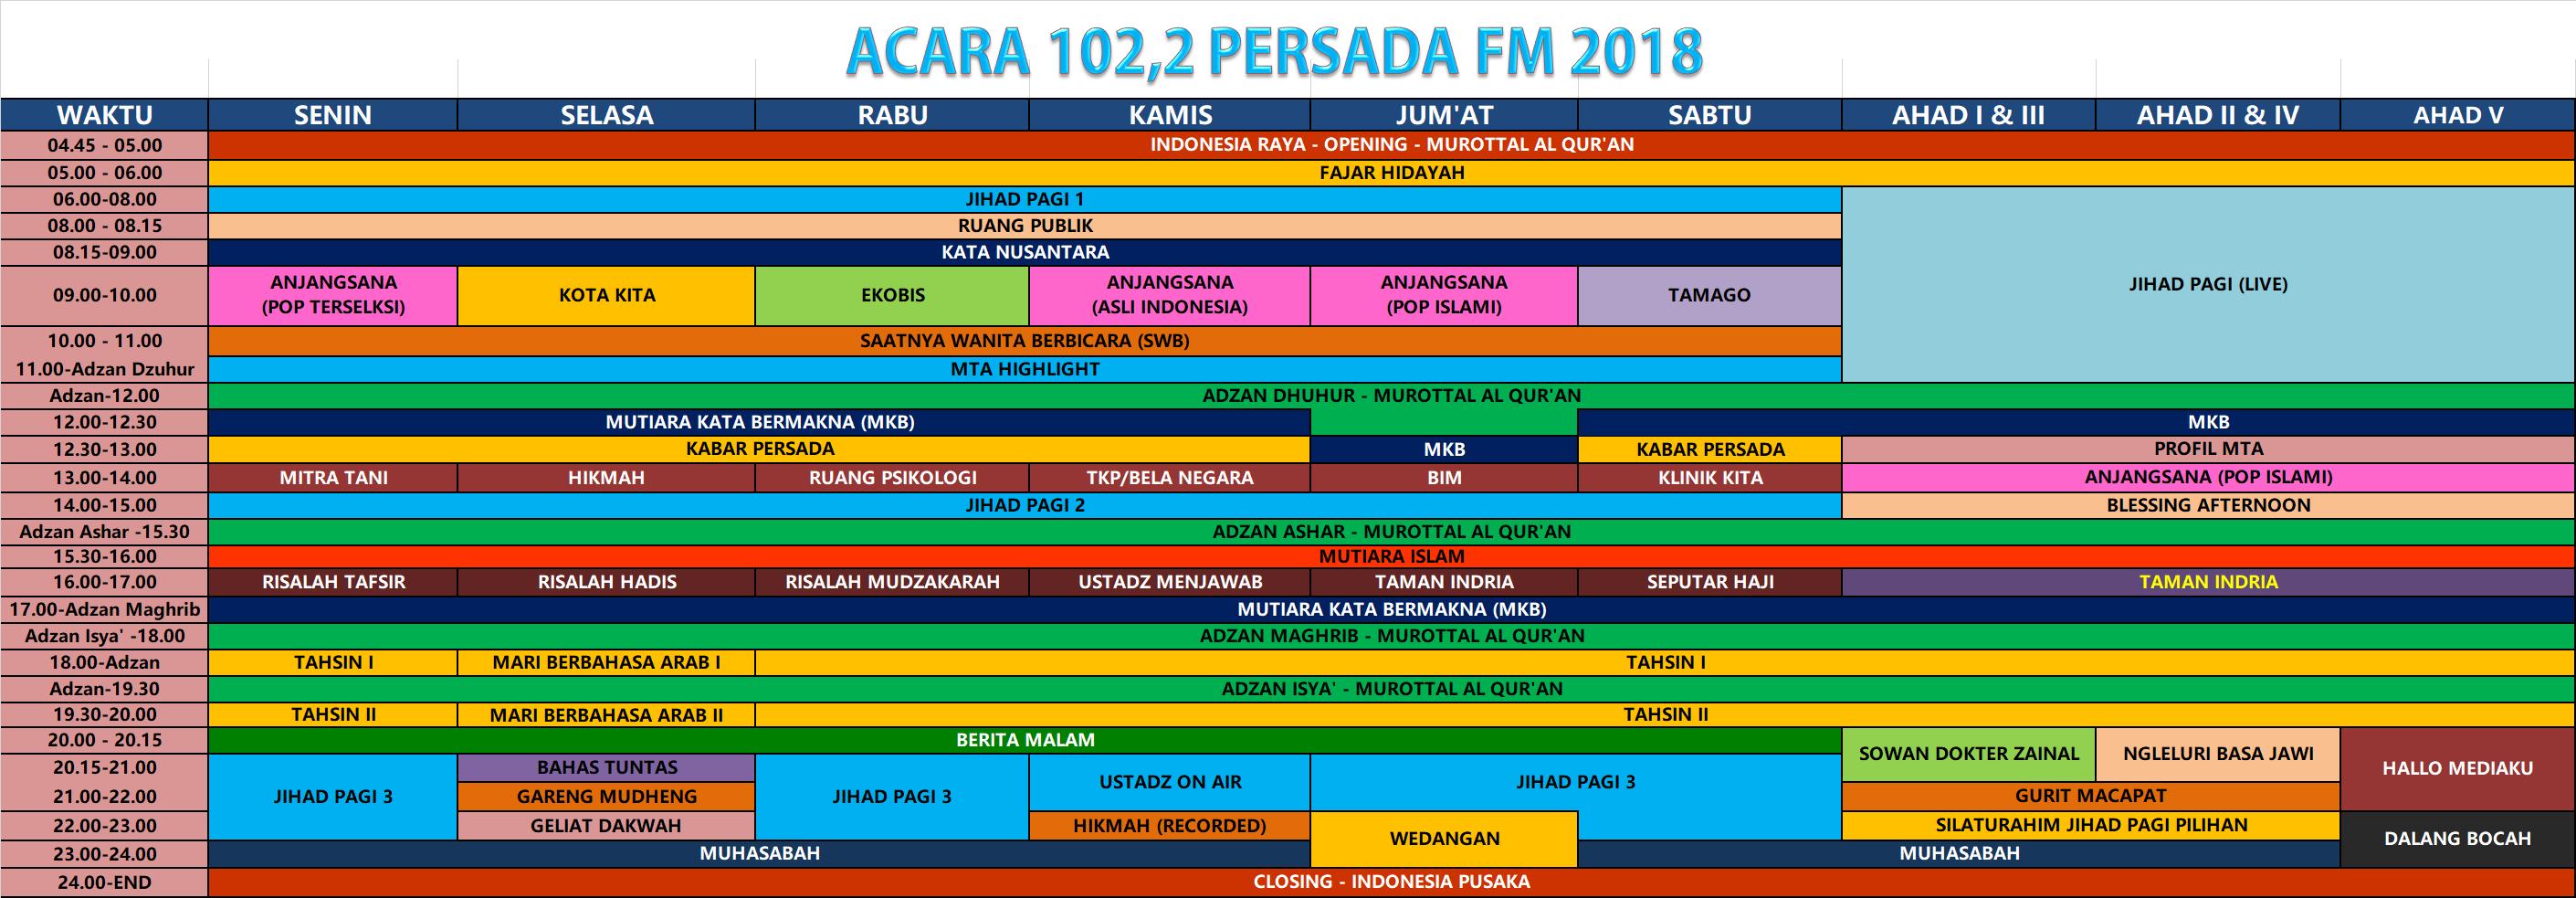 jadwal persada fm 2018